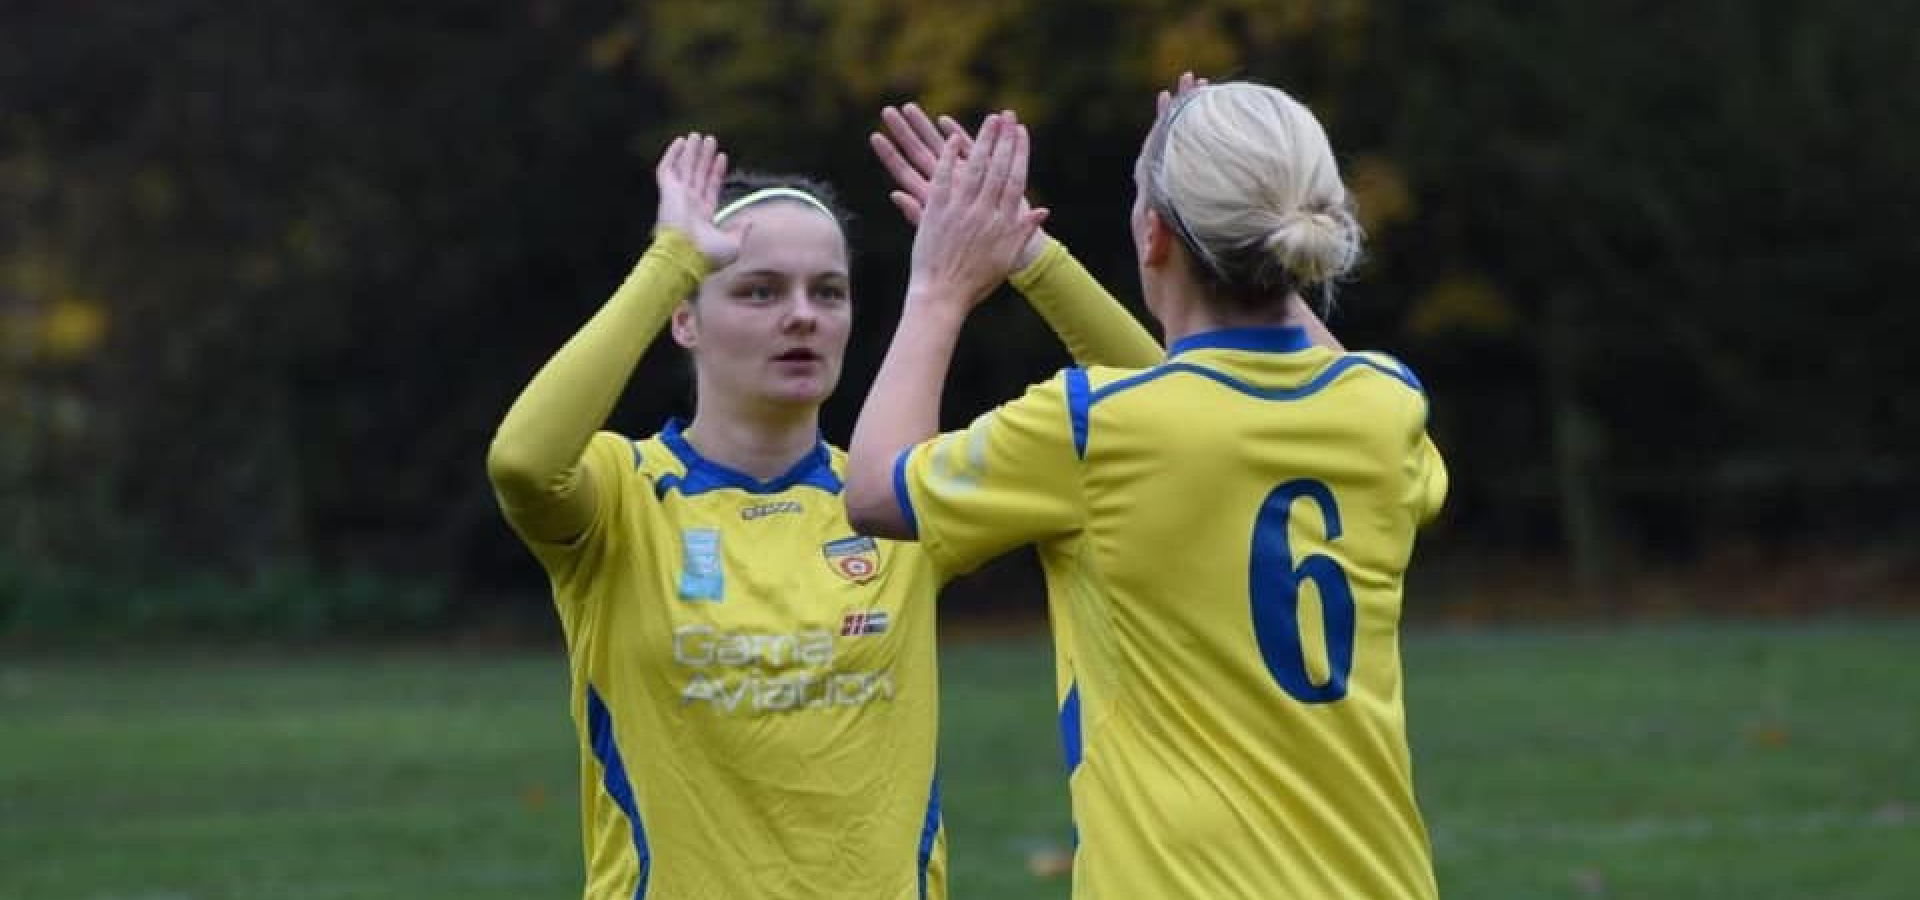 Spotlight: Providing a platform to perform: Rushmoor Ladies FC